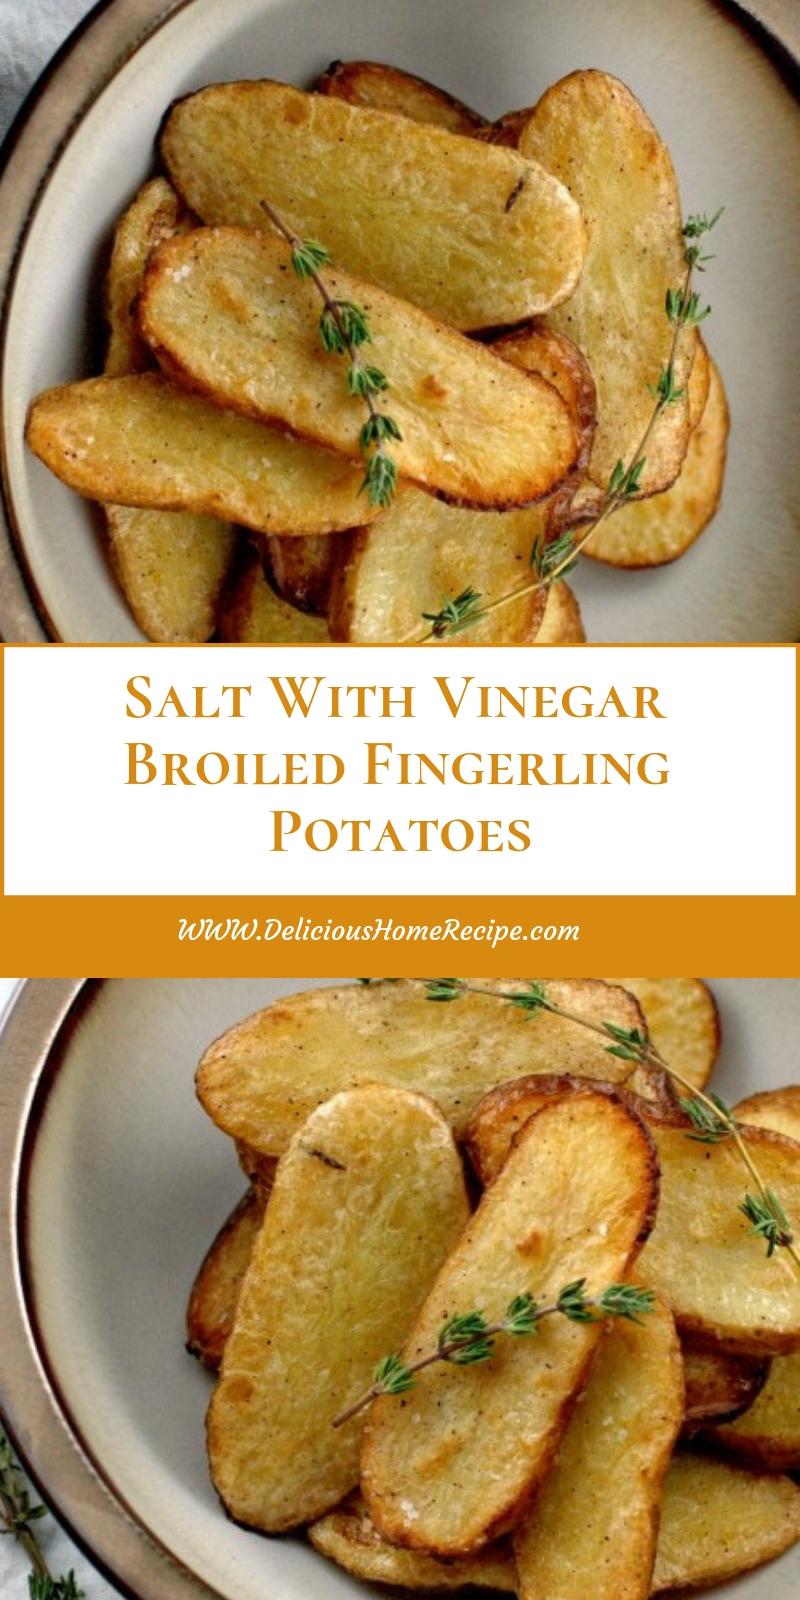 Salt With Vinegar Broiled Fingerling Potatoes